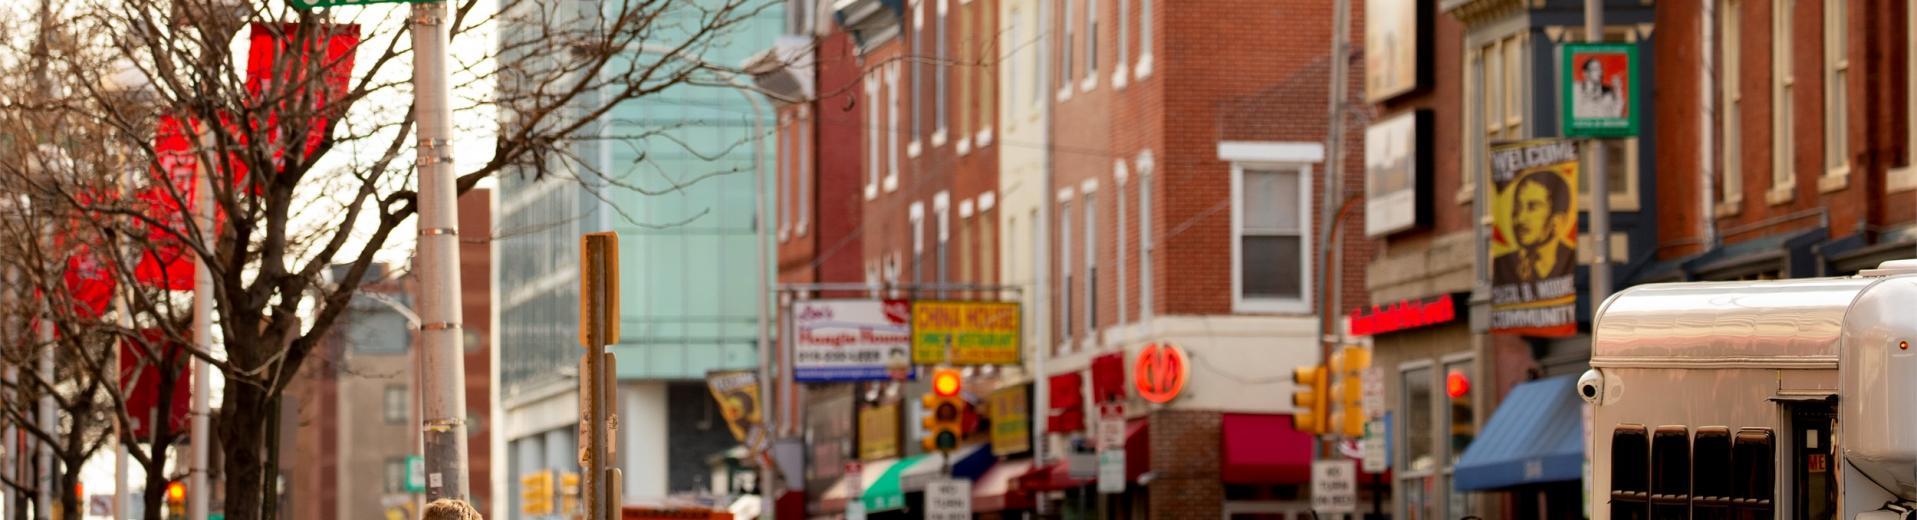 Businesses along Cecil B. Moore Avenue in North Philadelphia.